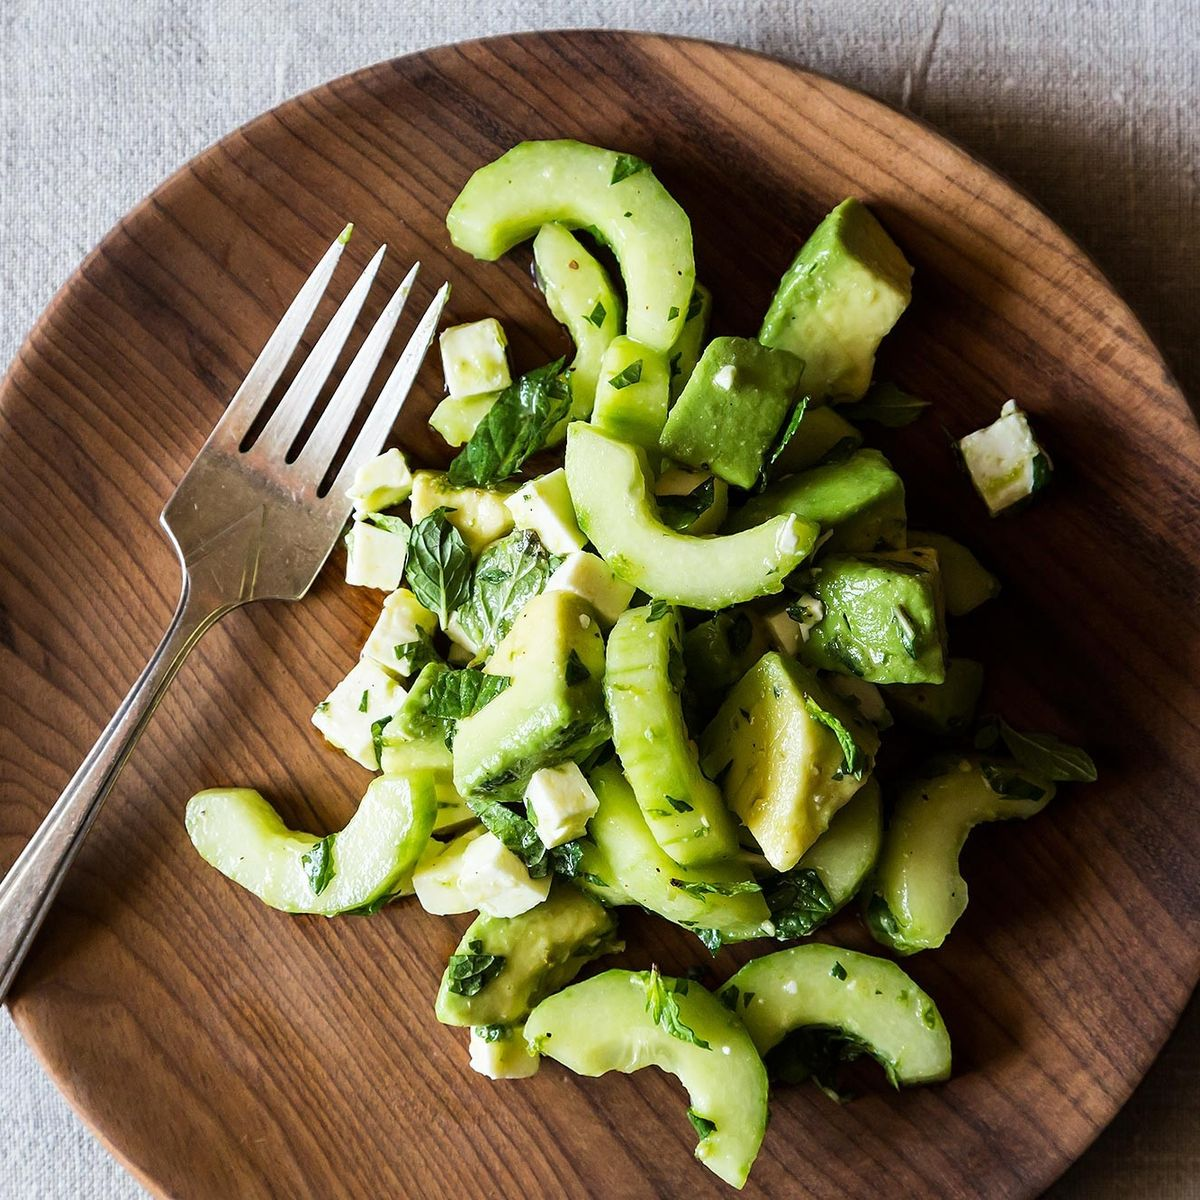 Crunchy Creamy Cucumber Avocado Salad Recipe On Food52